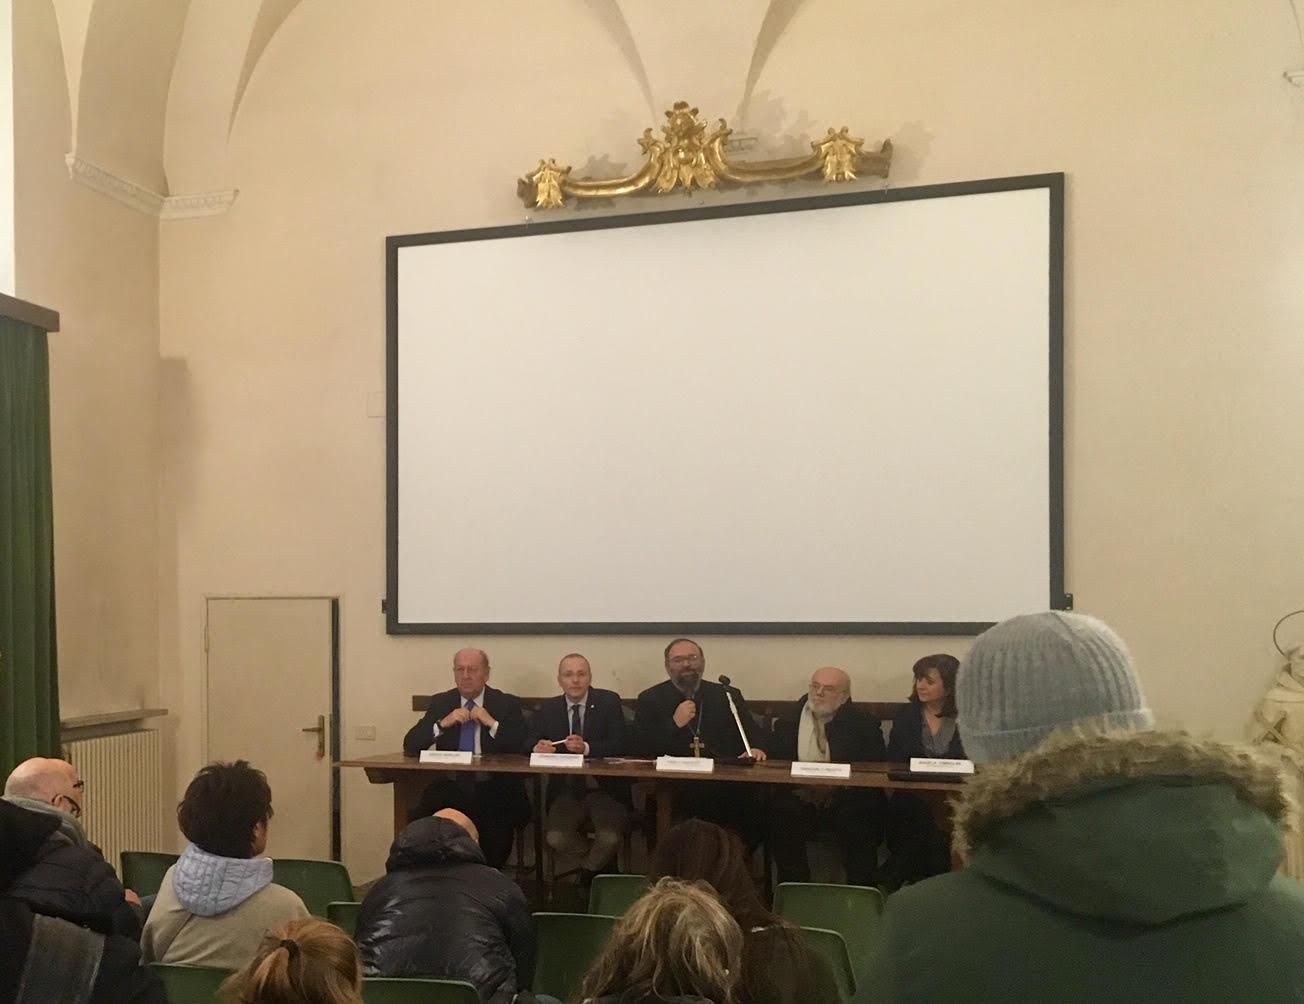 2018-12-14_Presentazione-da-natale-a-san-costanzo1